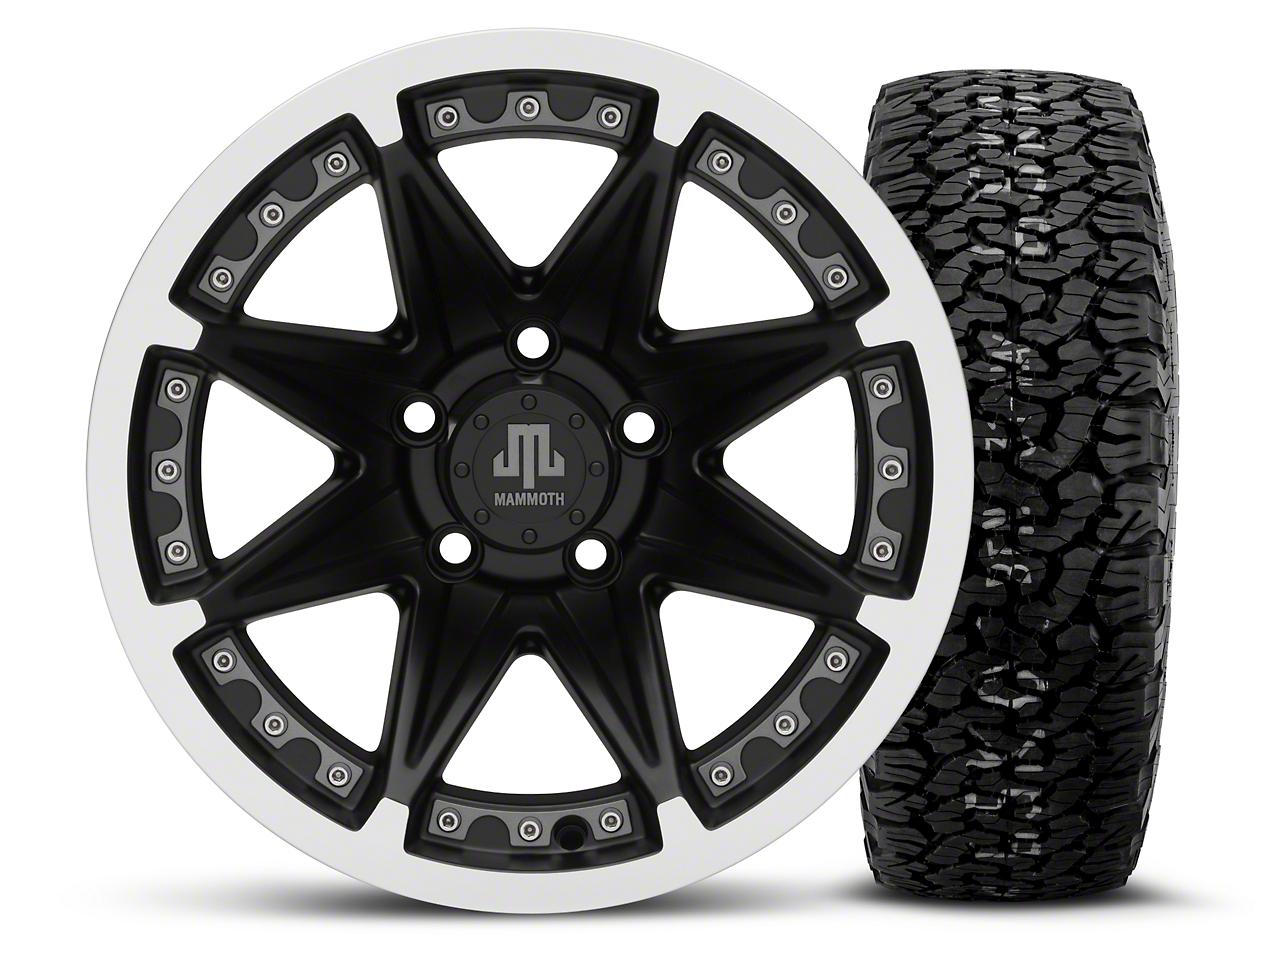 Mammoth Type 88 Black 15x8 Wheel & BF Goodrich All Terrain TA KO2 35x12.5R15 Tire Kit (87-06 Jeep Wrangler YJ & TJ)